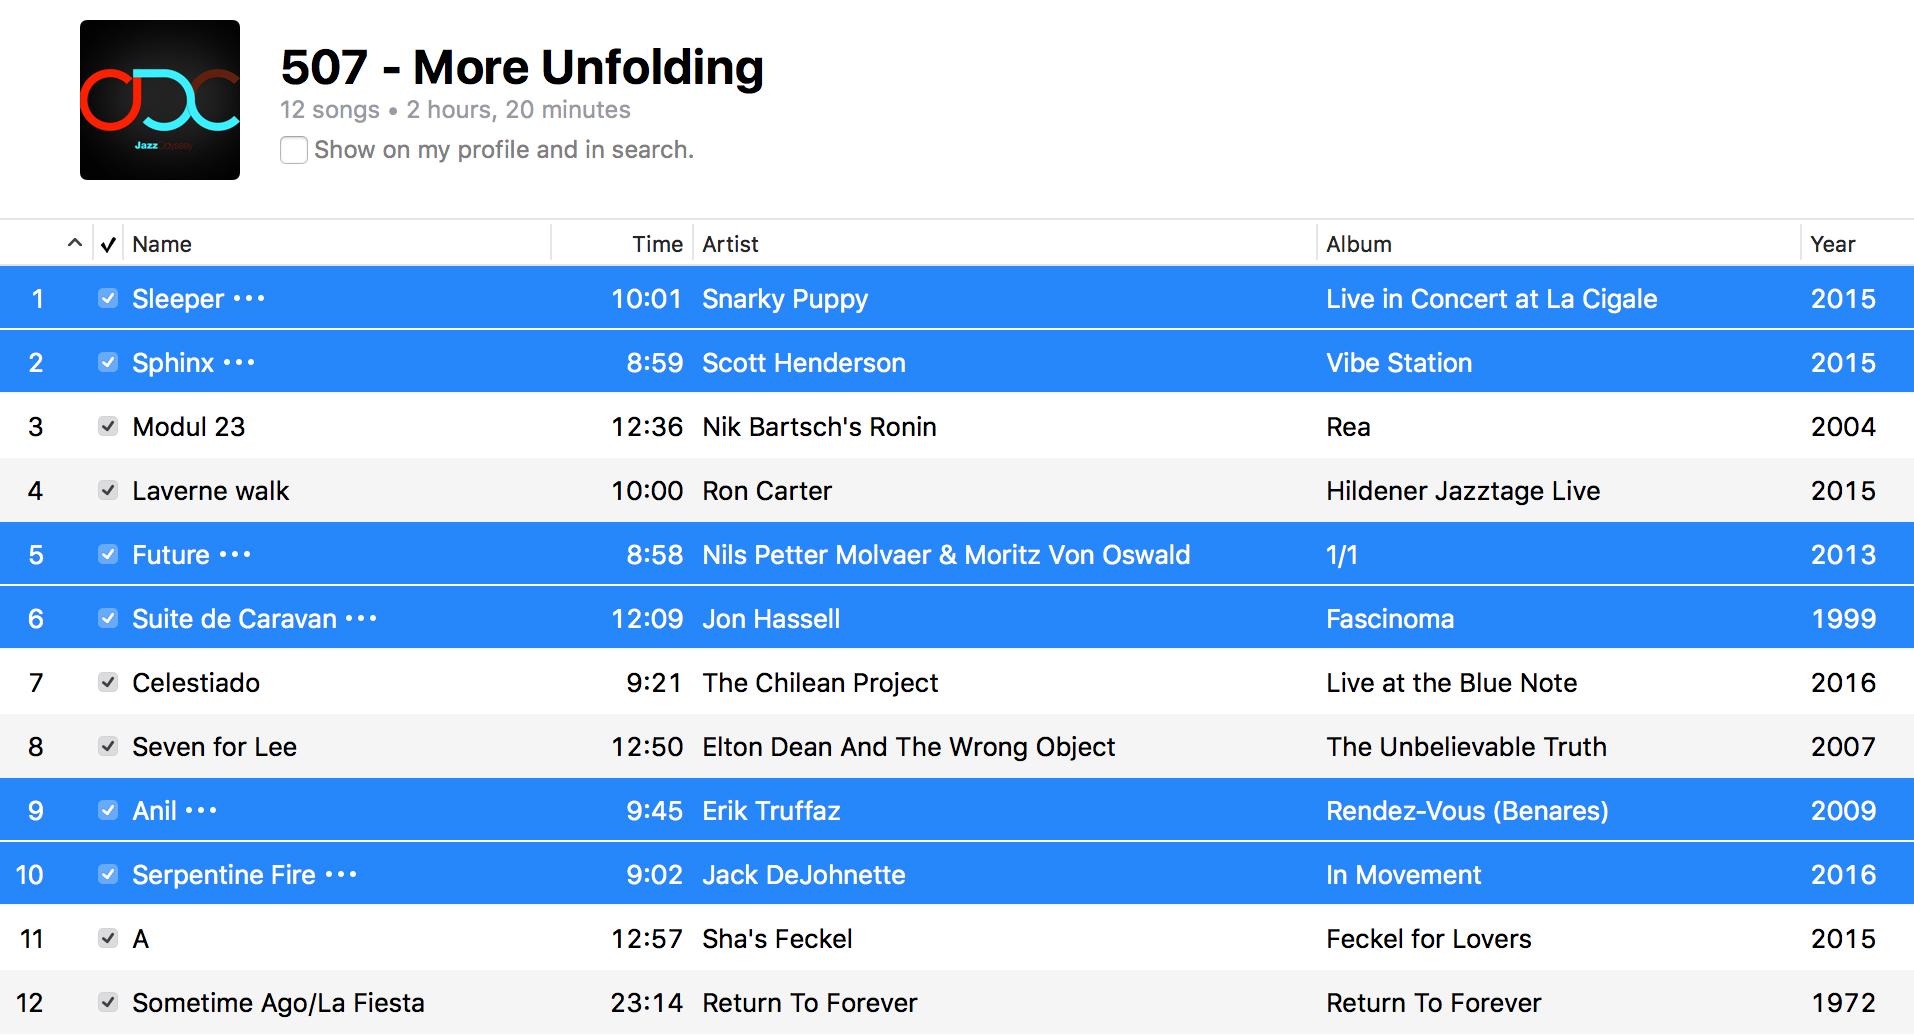 Jazz ODC #507 - More Unfolding - Playlist